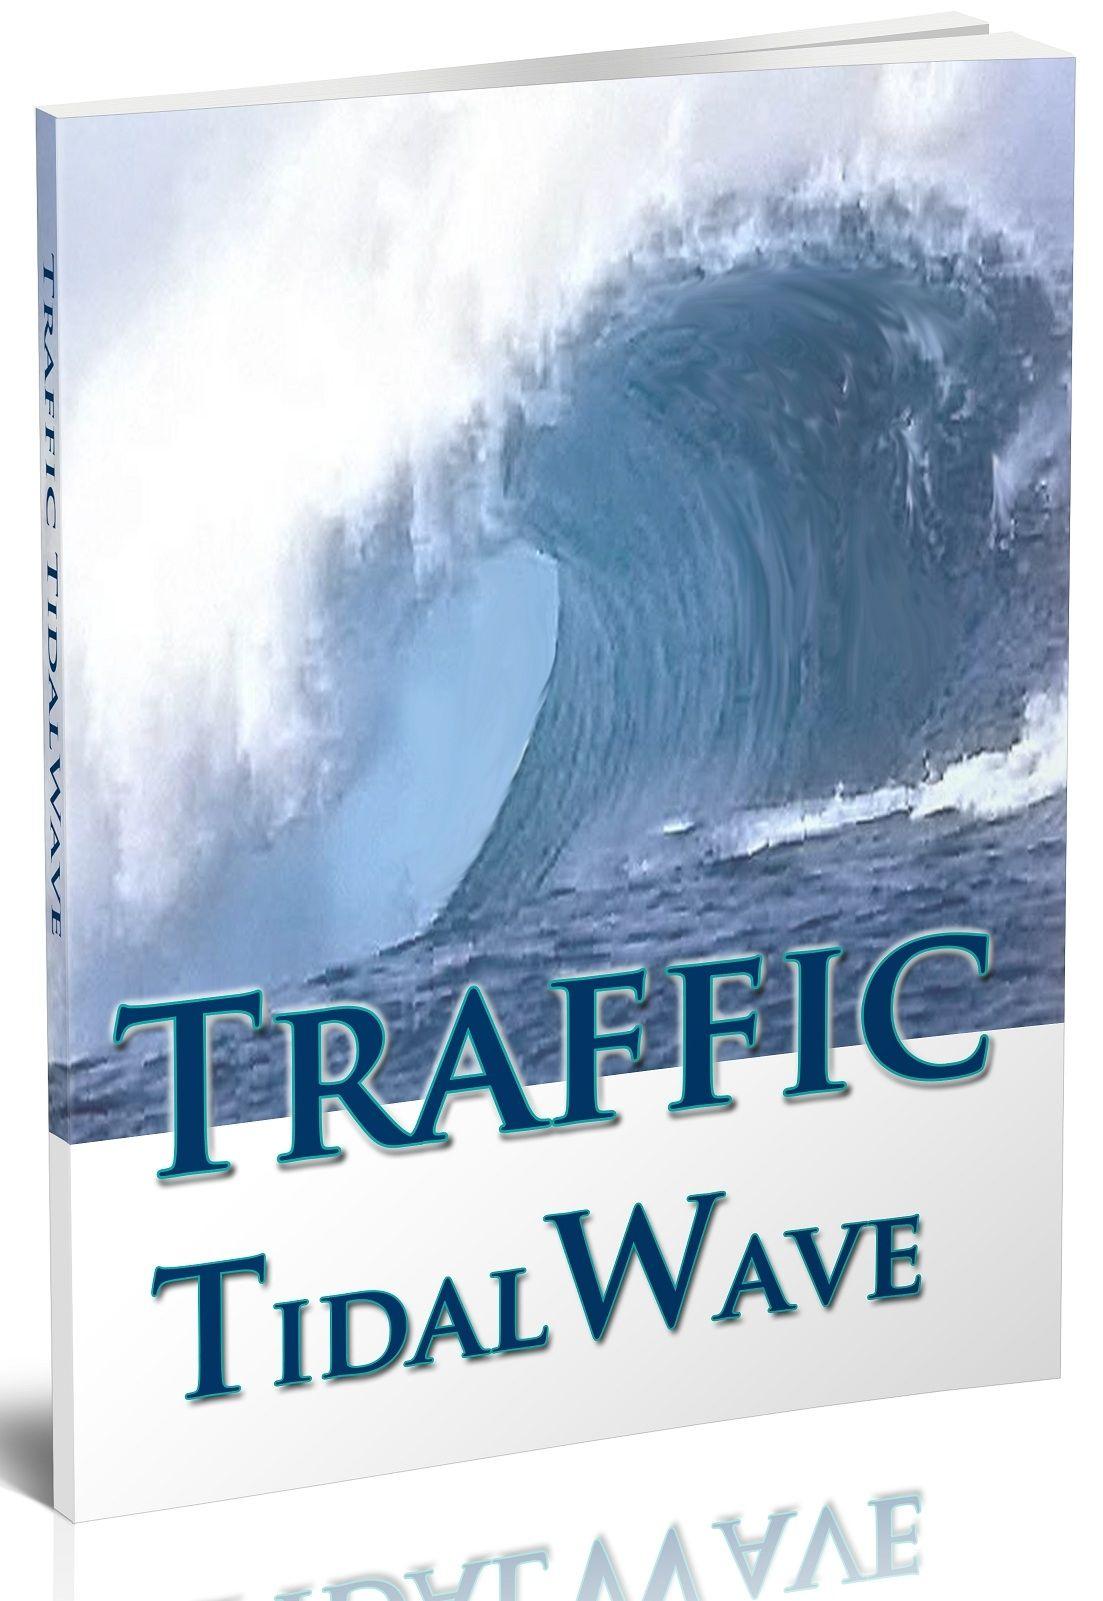 Traffic Tidalwave